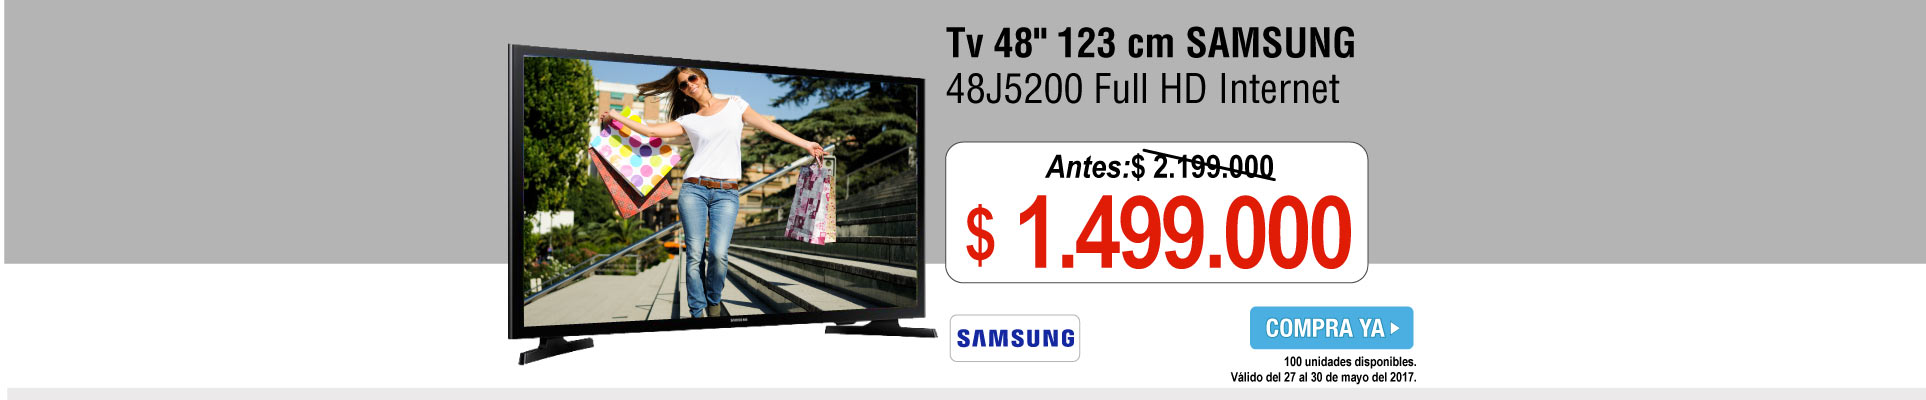 Tv 48 123 cm SAMSUNG 48J5200 Full HD Internet - banner principal